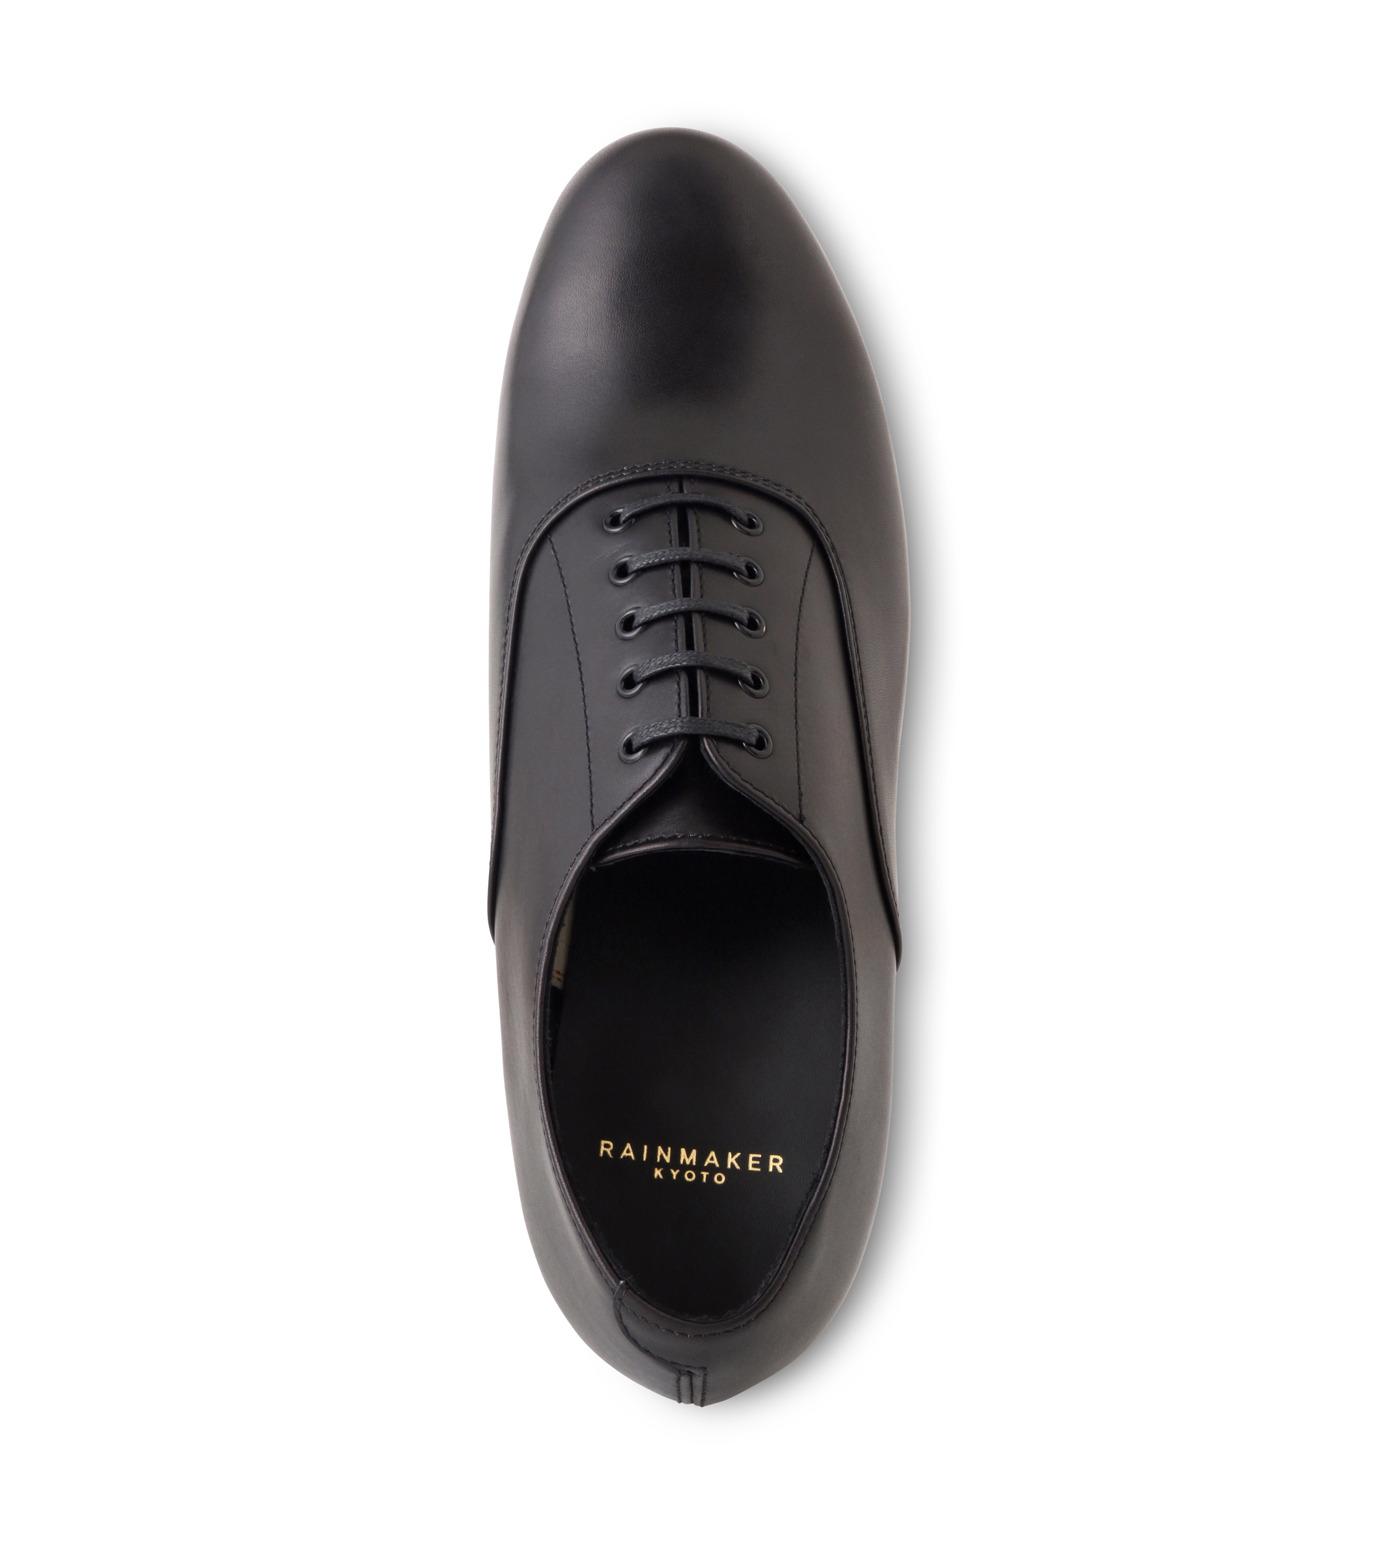 RAINMAKER(レインメーカー)のoxford shoes-BLACK(シューズ/shoes)-RM162-020-13 拡大詳細画像4